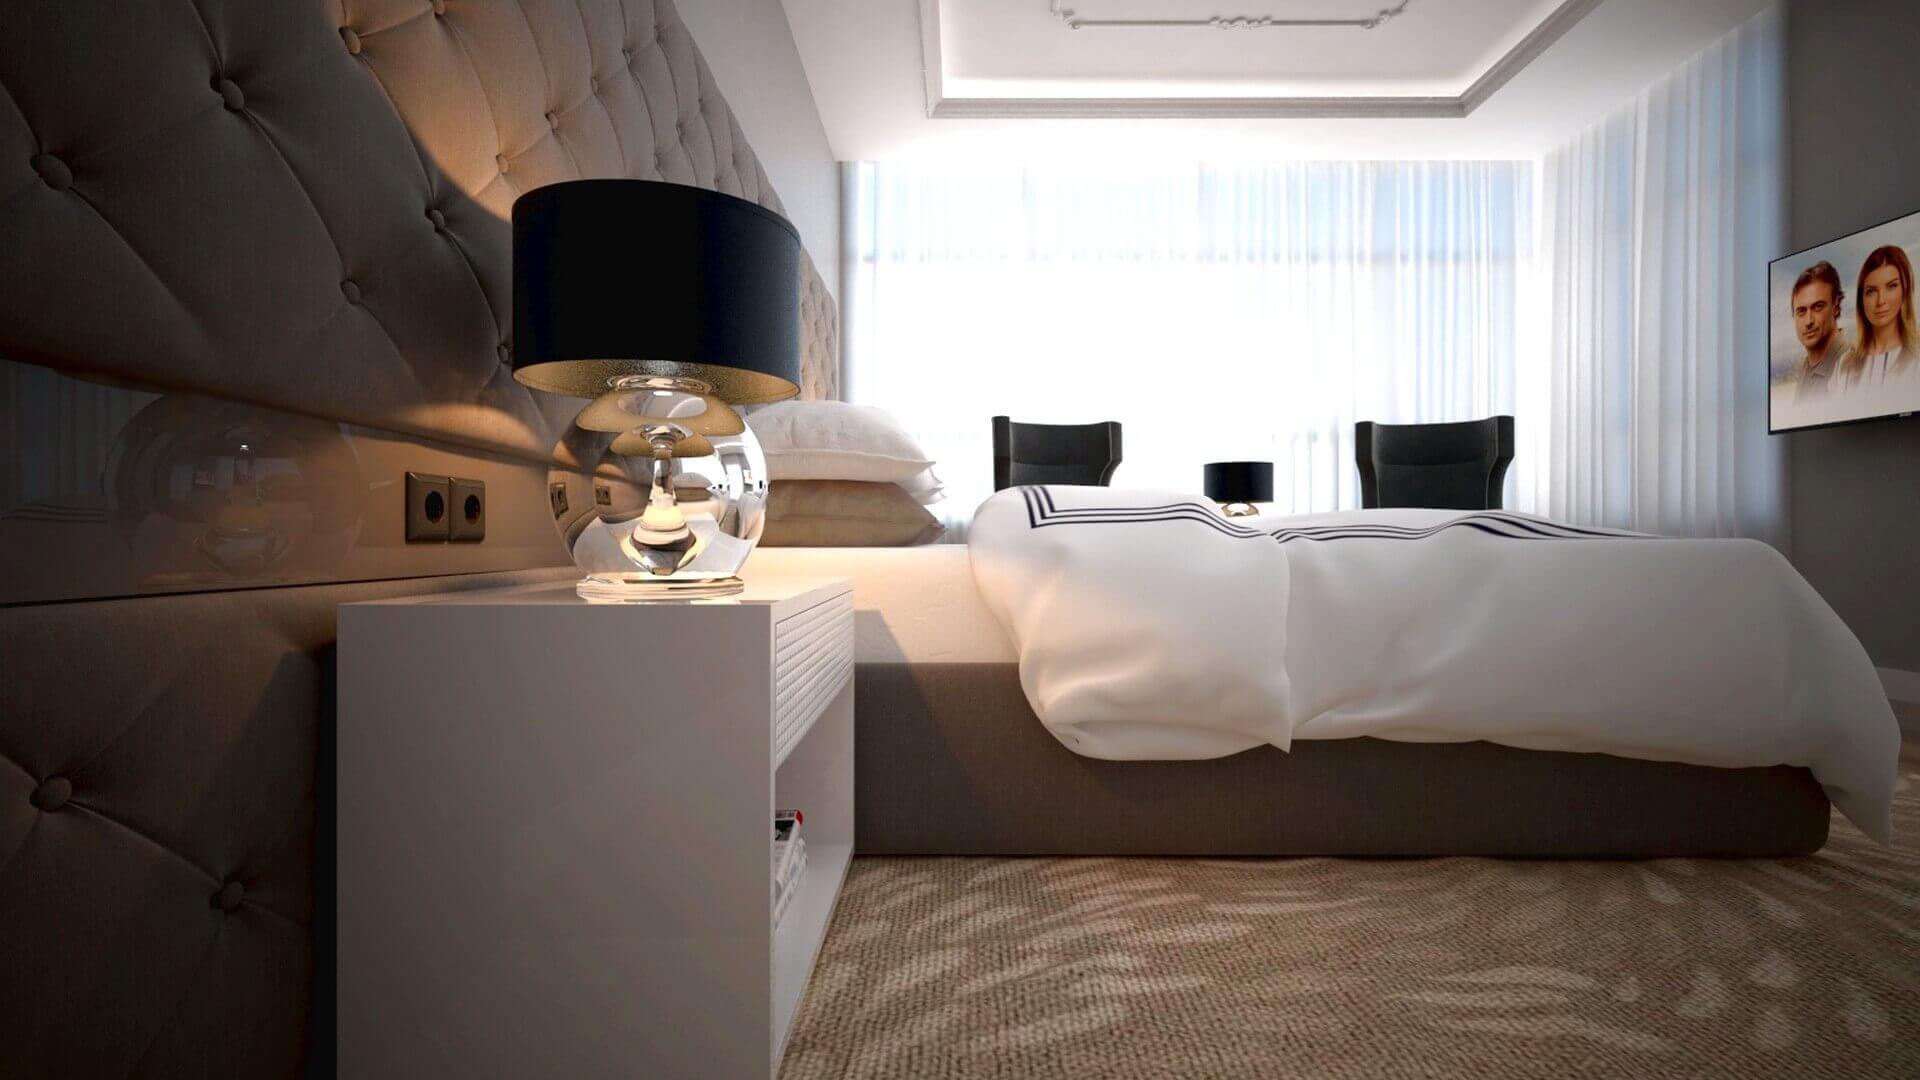 House interior designer 3441 Aslan House Residential